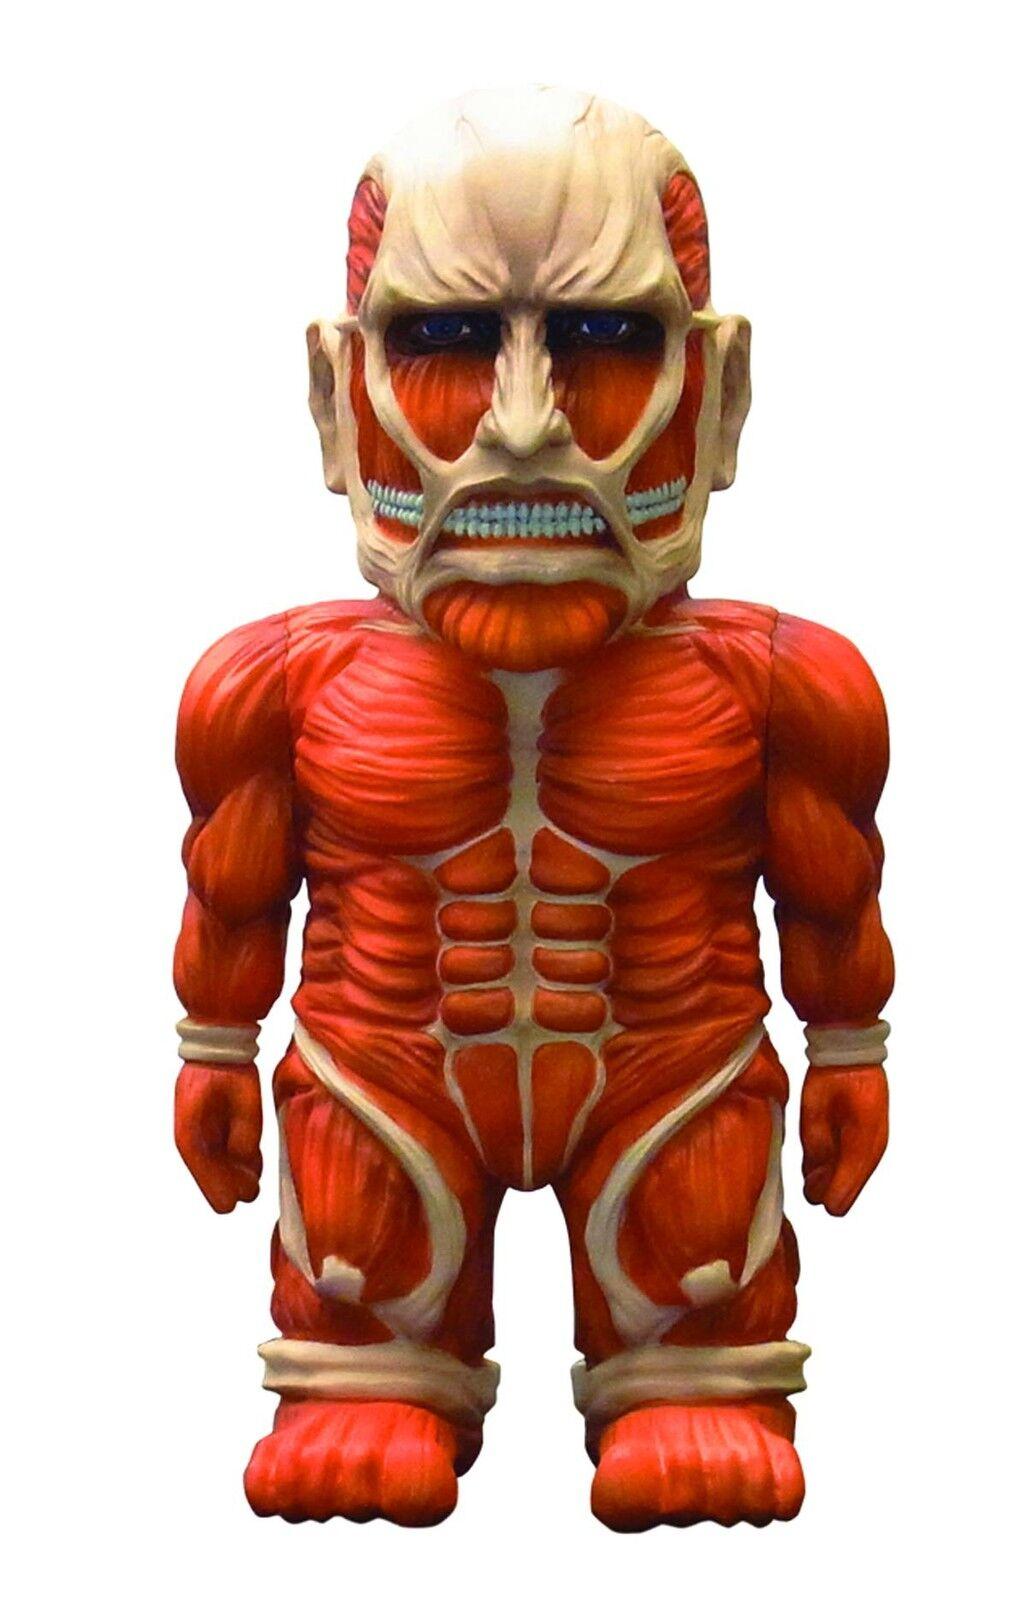 Ataque al Titán colosal Titán Suave 8 Pulgadas Figura De Vinilo